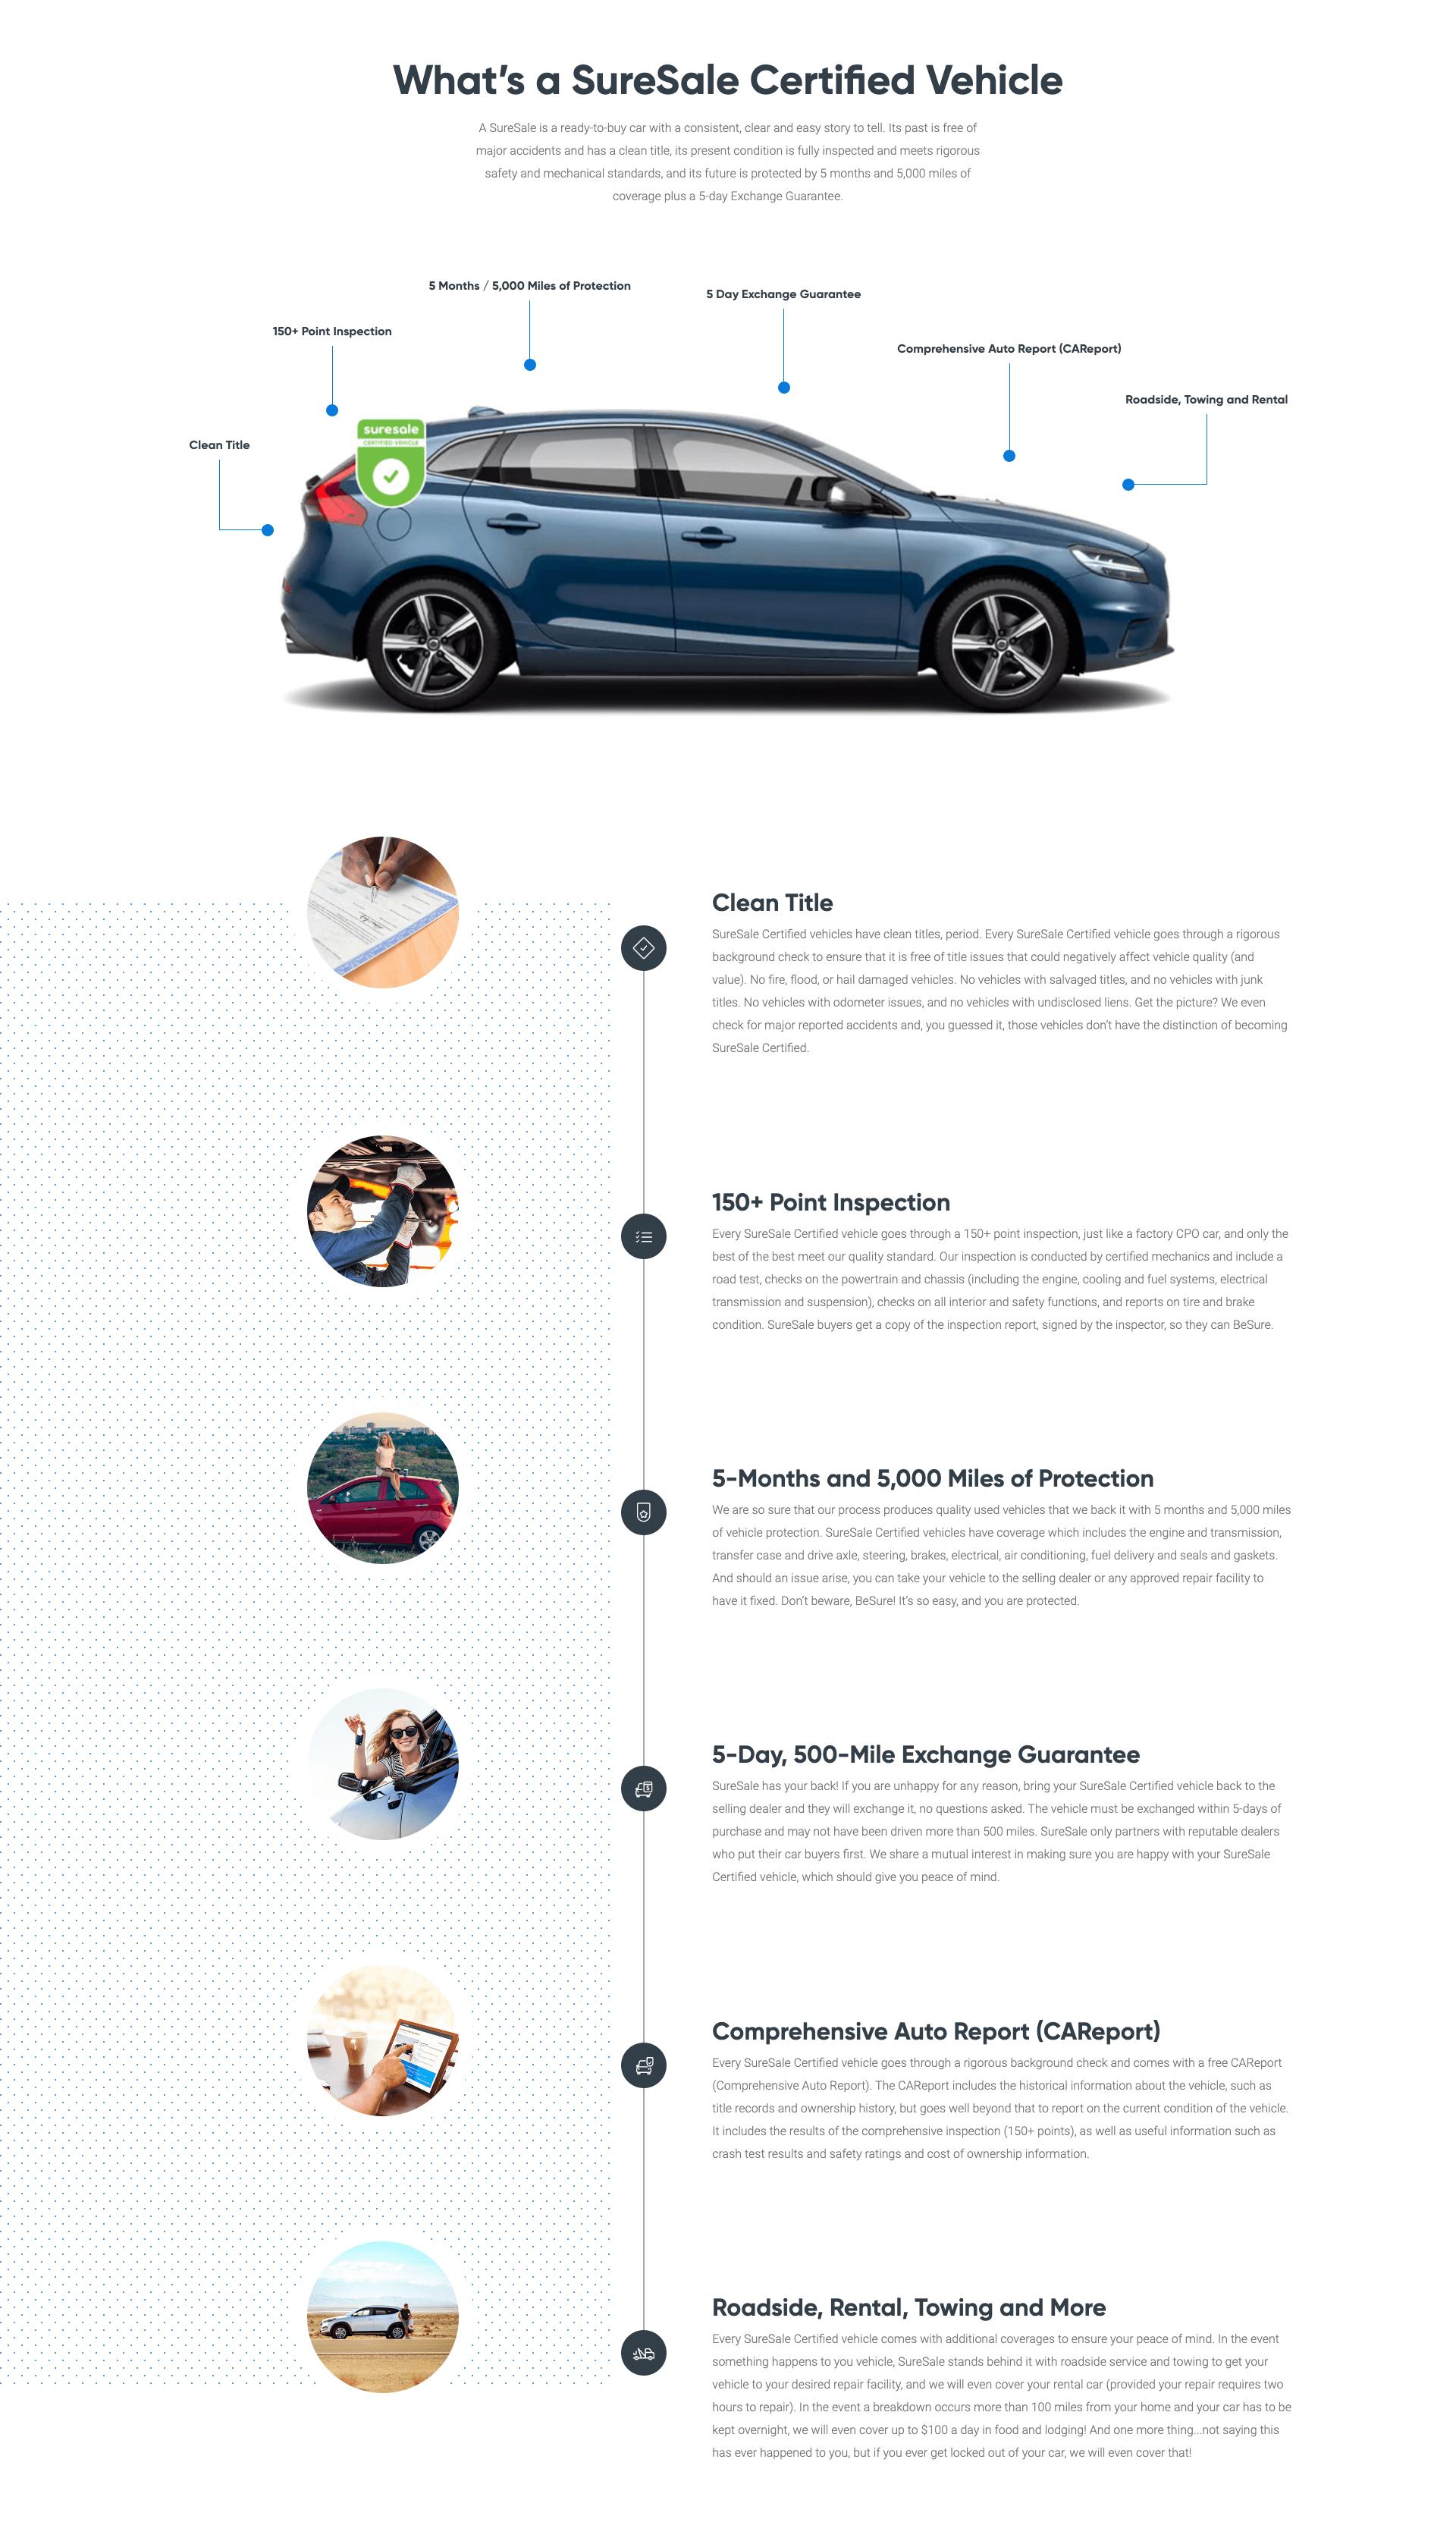 SureSale Overview